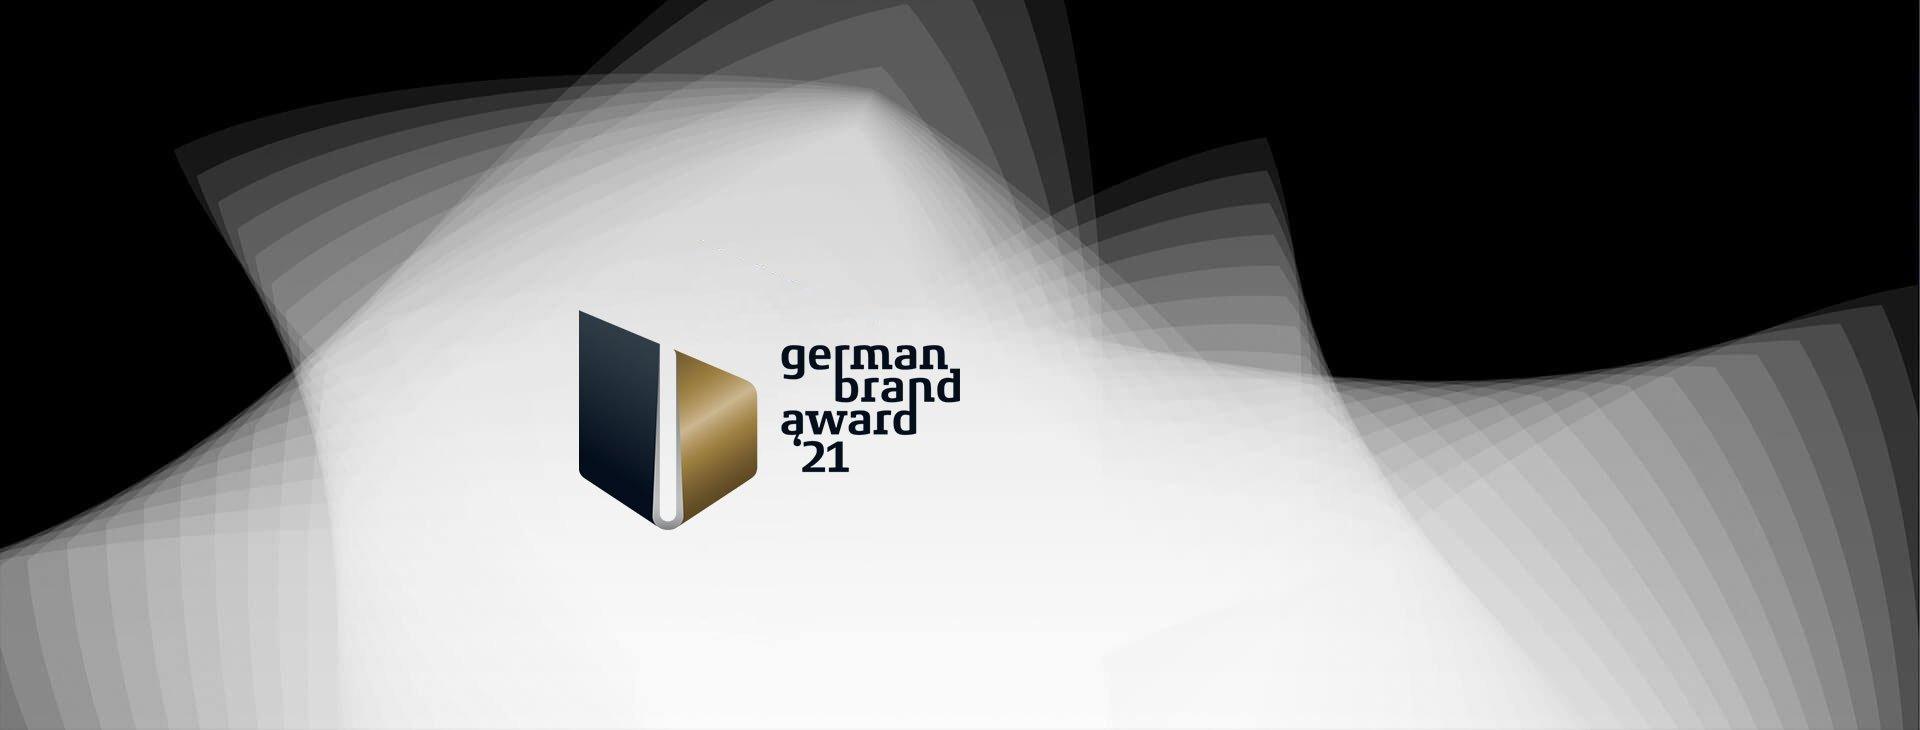 stilwerk_german_brand_award_2021_stage